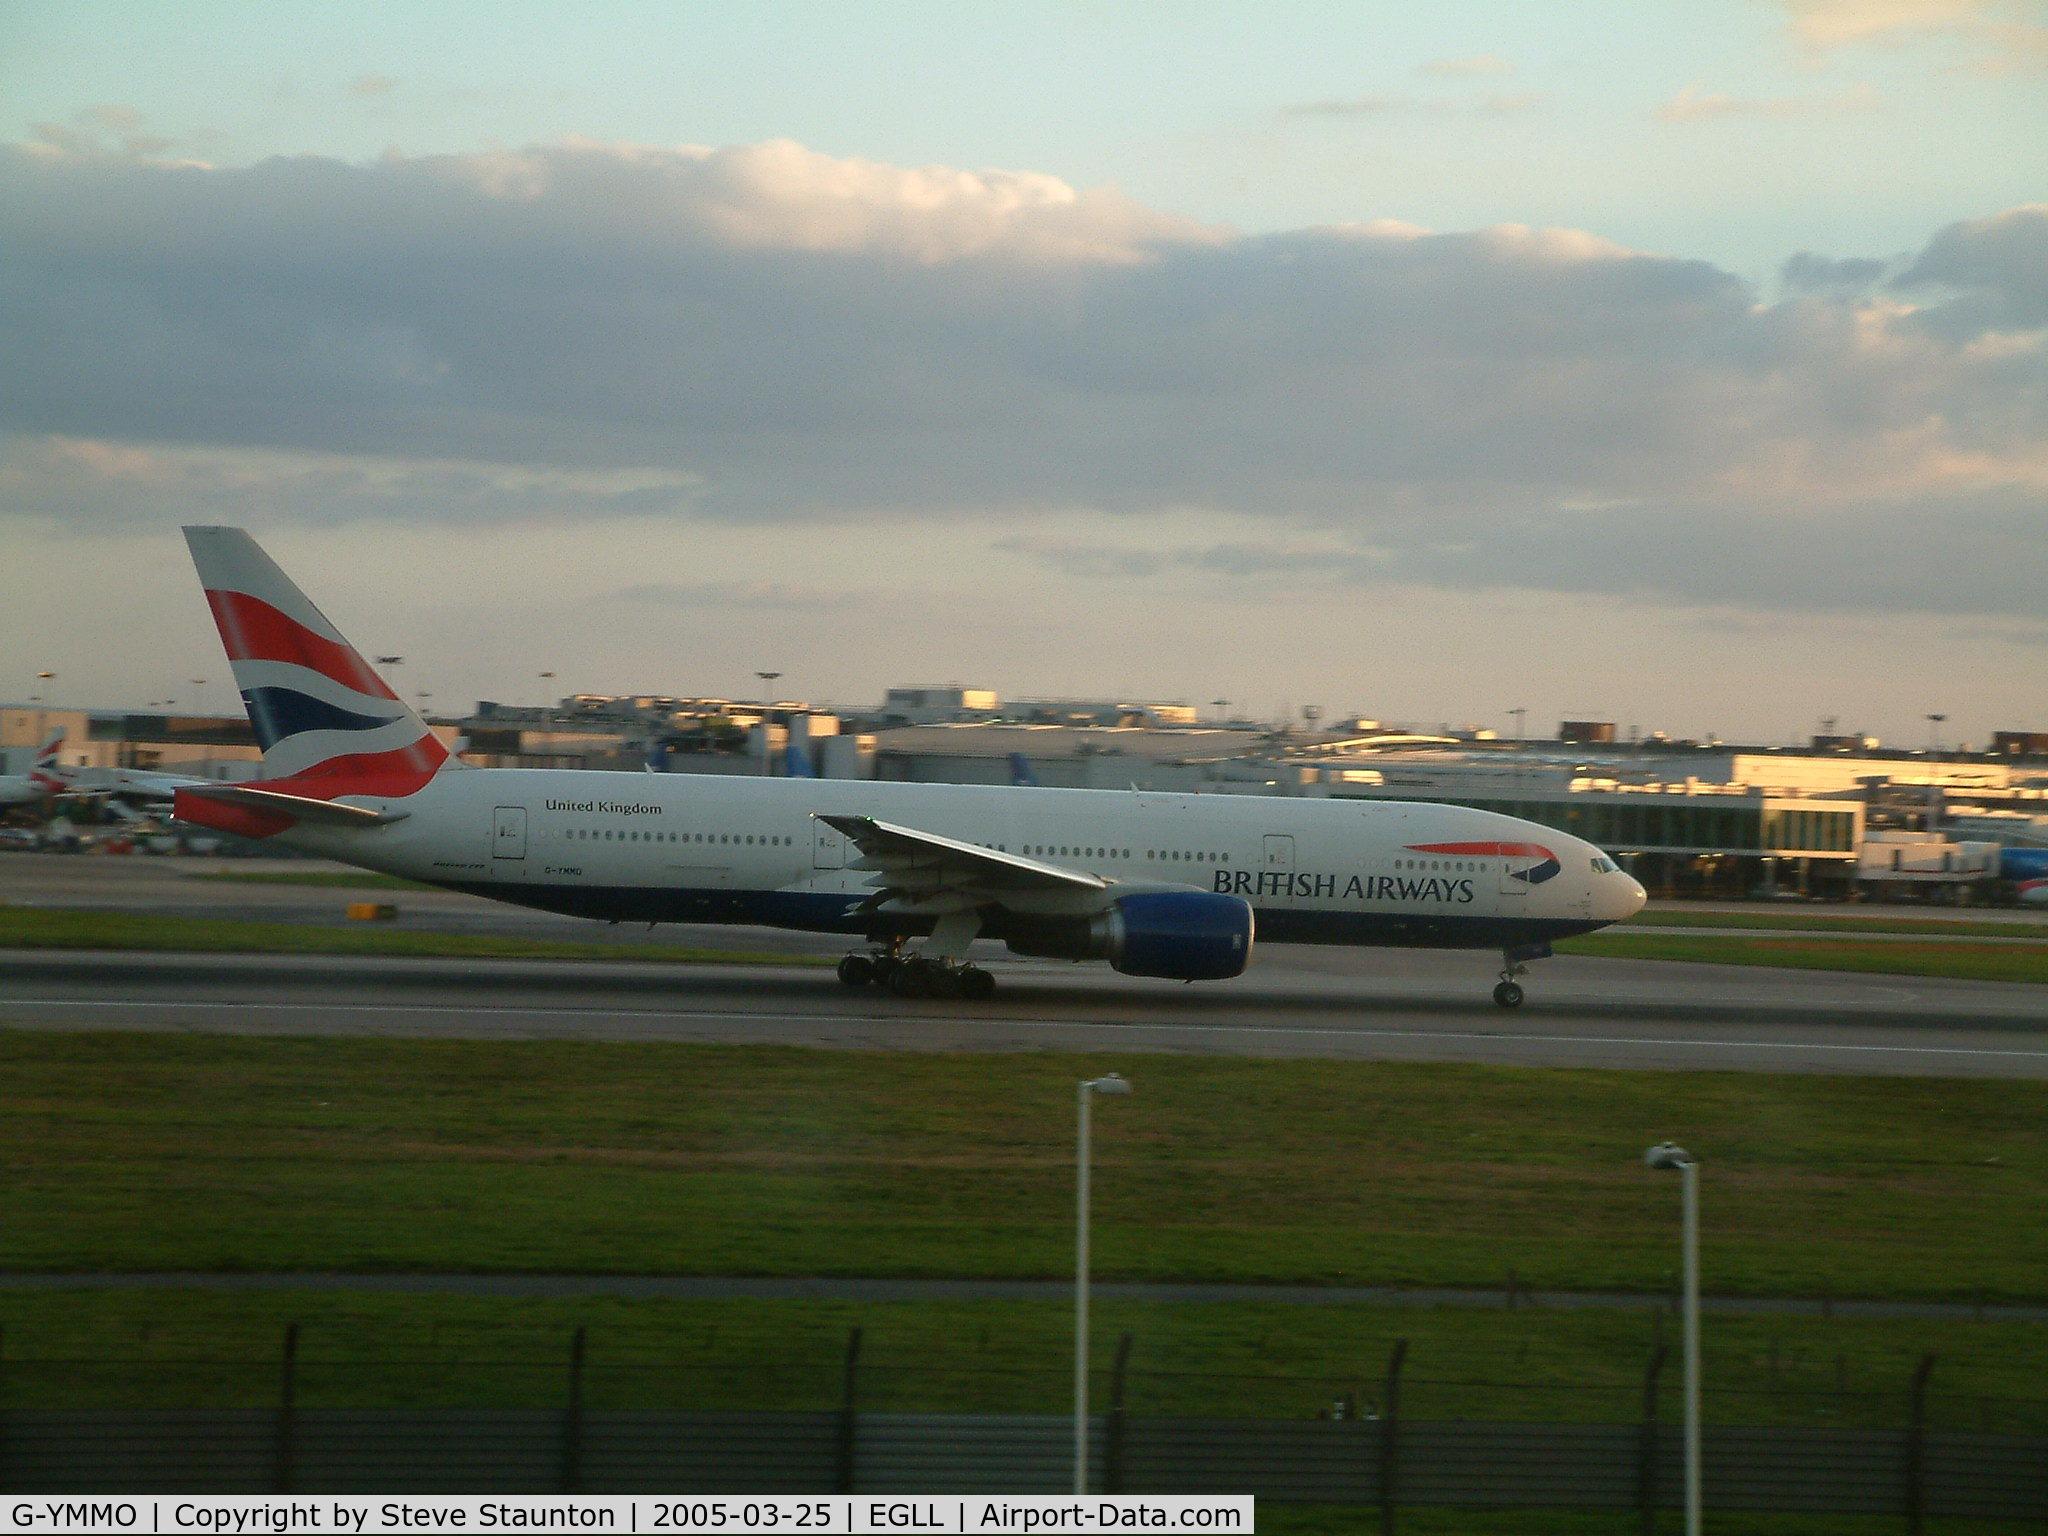 G-YMMO, 2001 Boeing 777-236 C/N 30317, Taken at Heathrow Airport March 2005